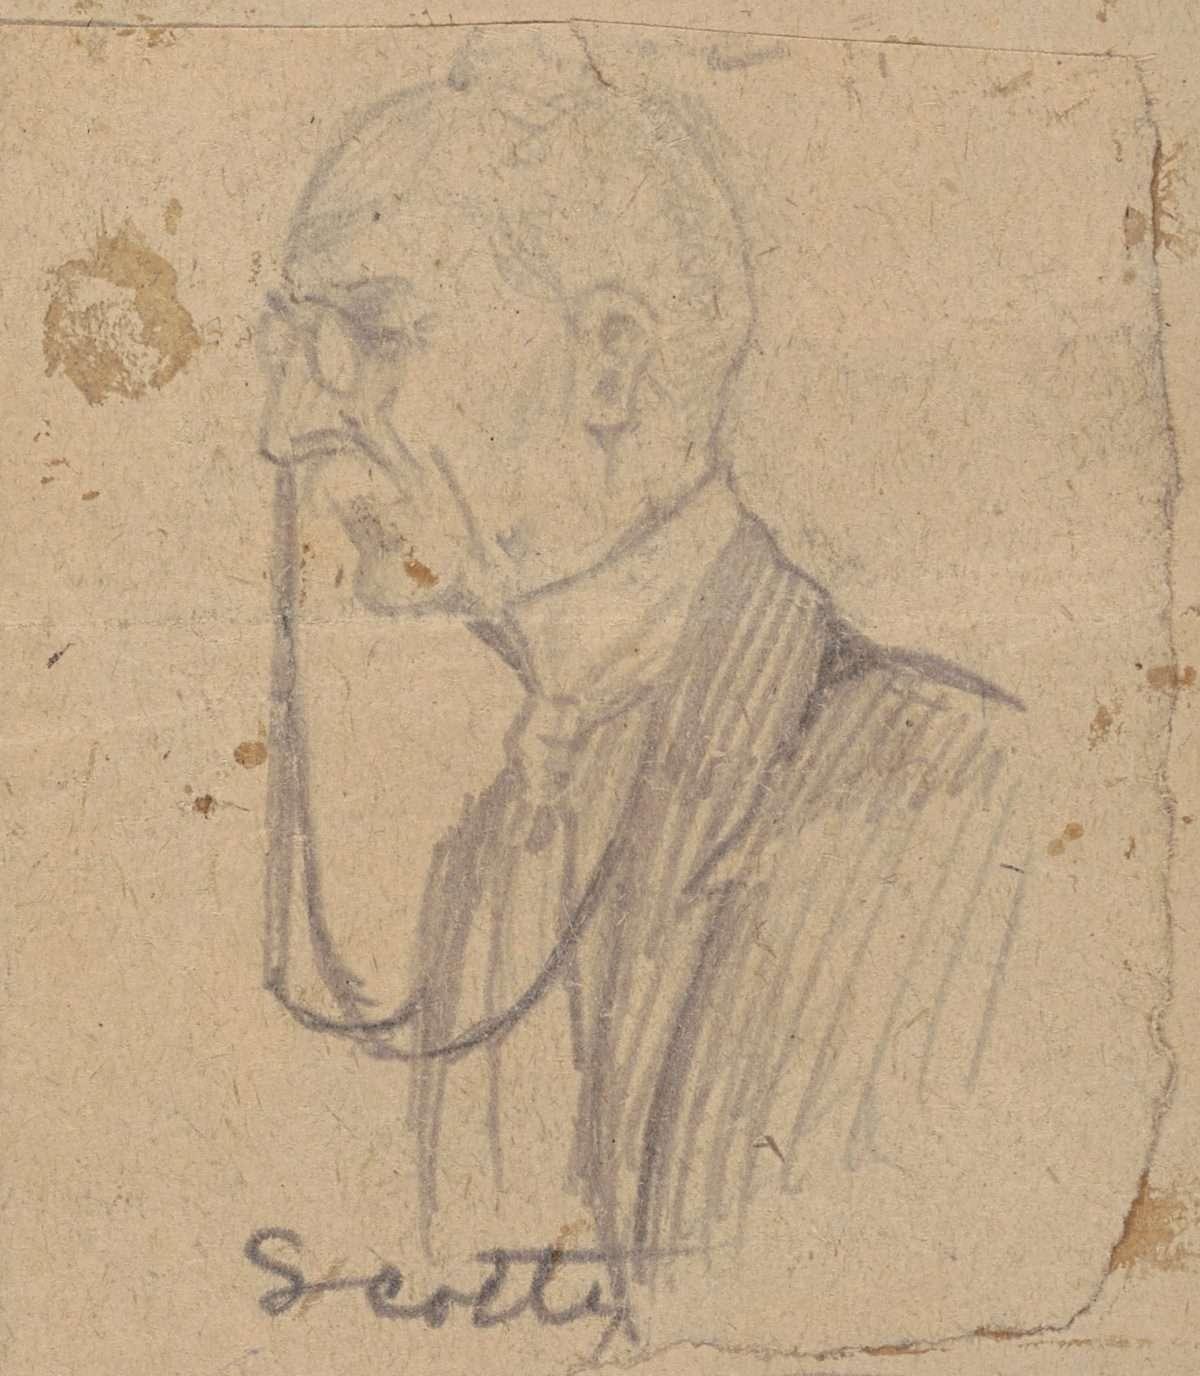 Sketch of Walter Scott Copeland